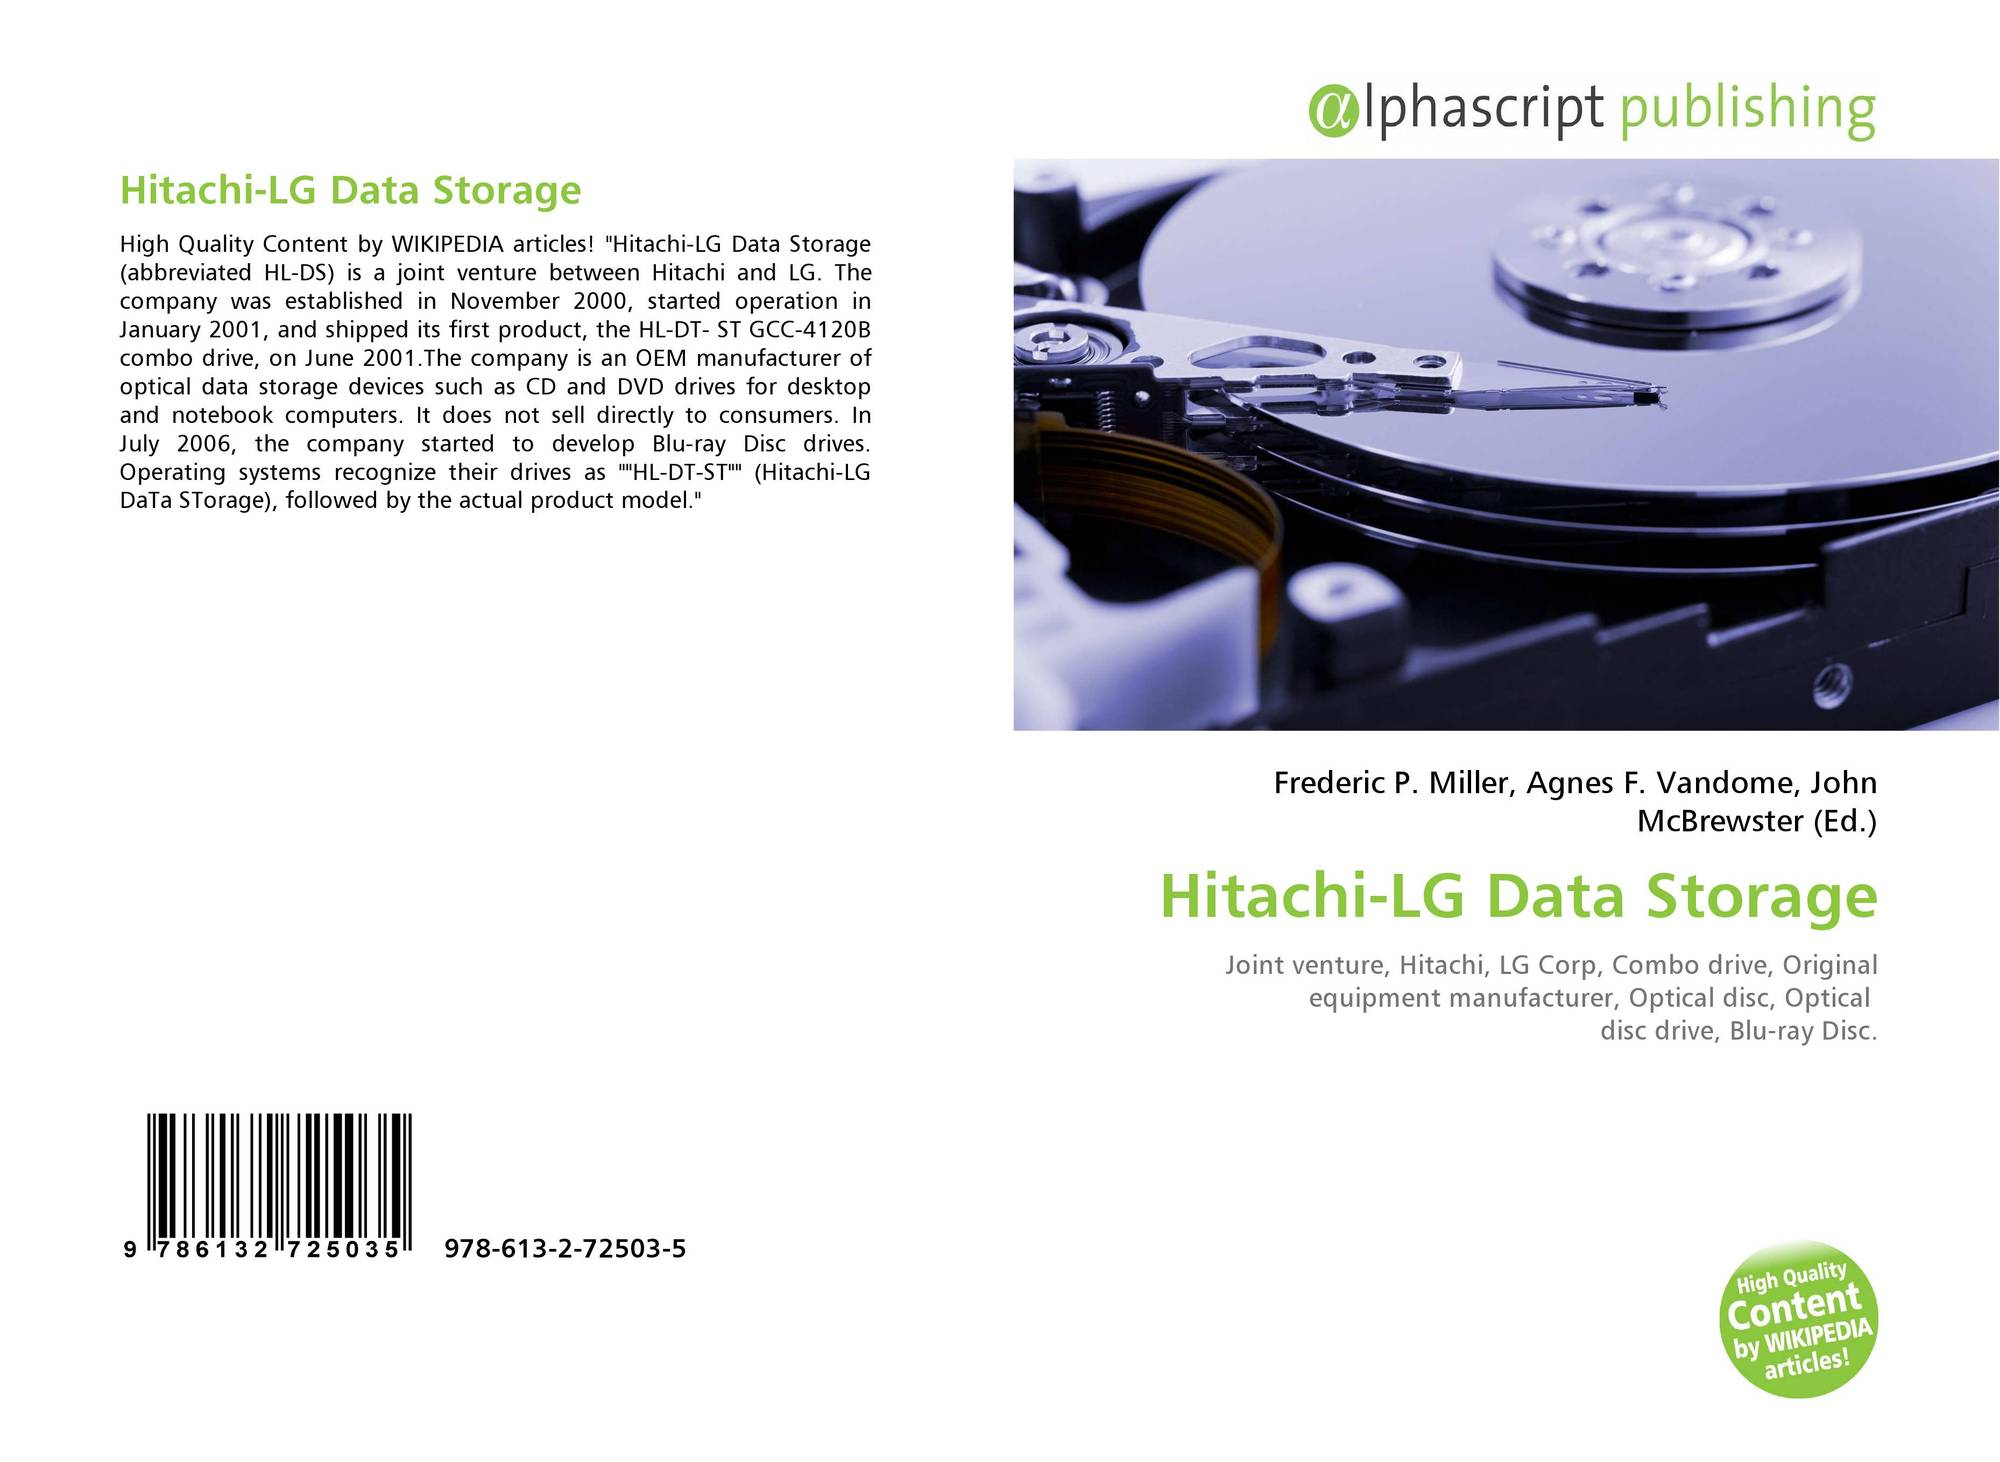 HL-DT-ST RW DVD GCC-4120B FREE DRIVERS PC